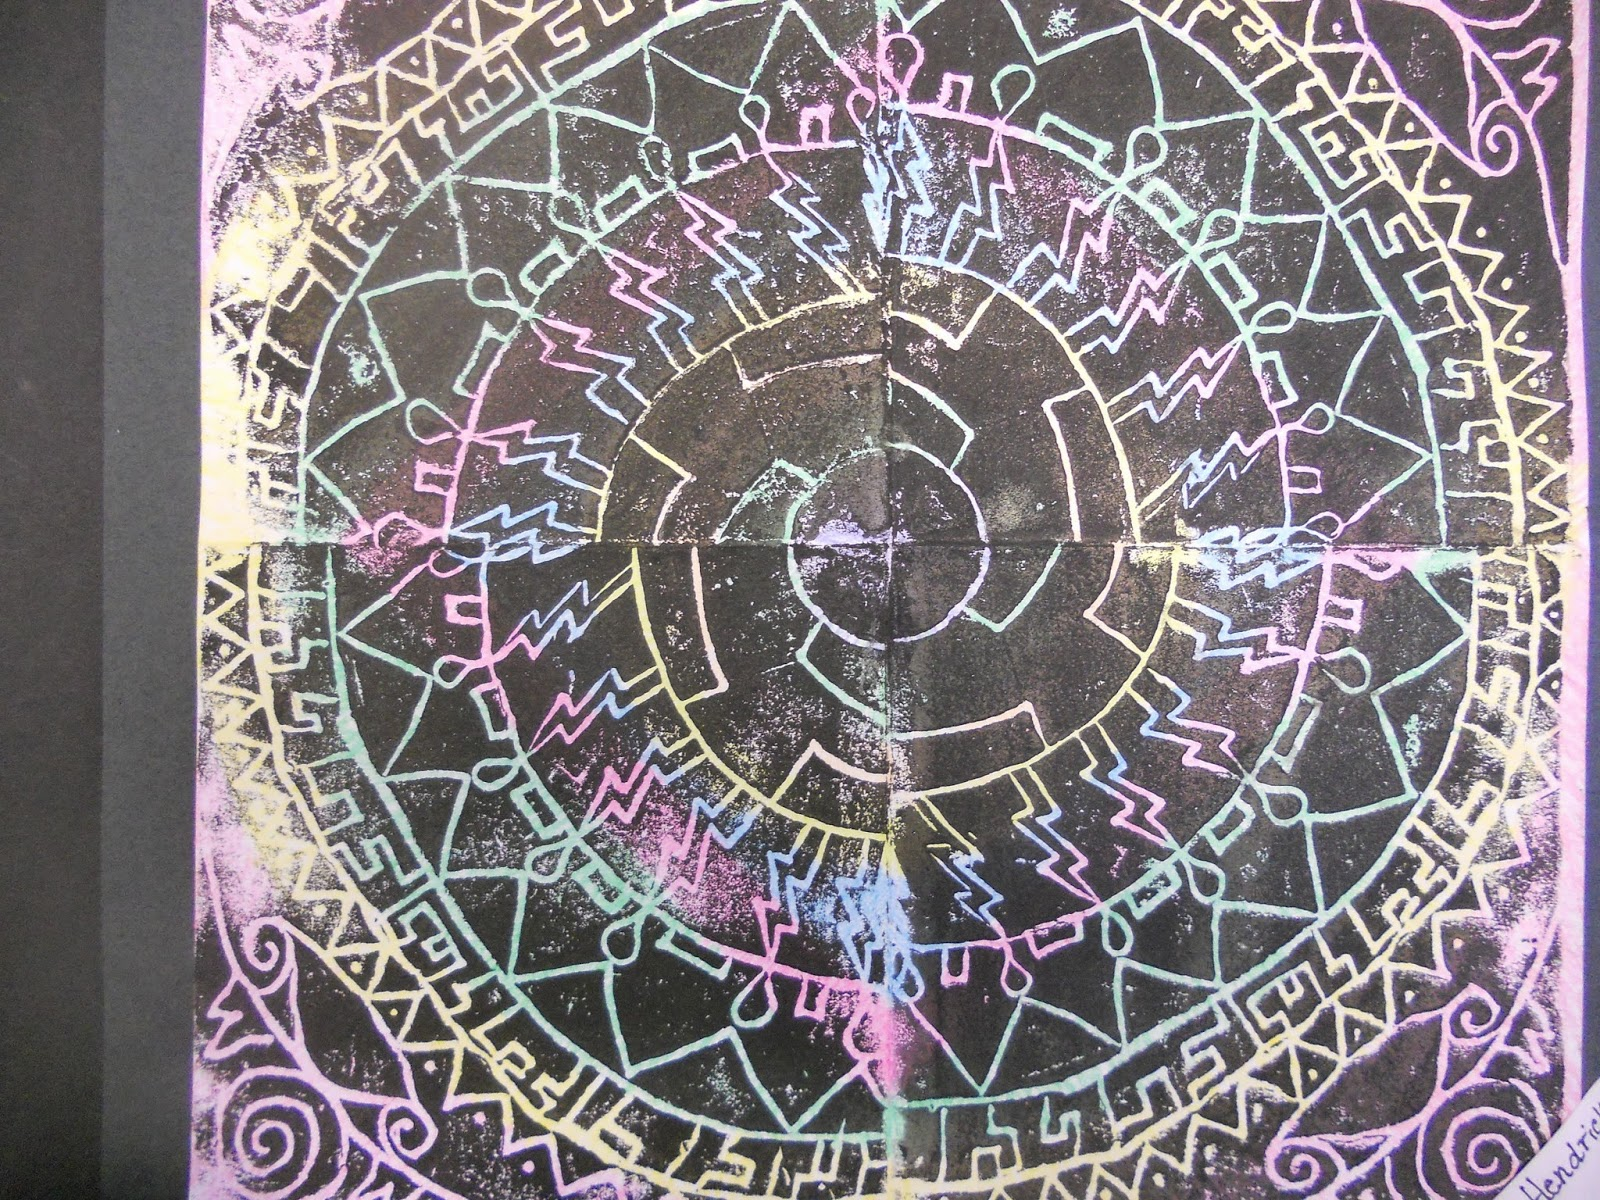 Little Dog Art Blog: 5th Grade Rotational Symmetry Printmaking